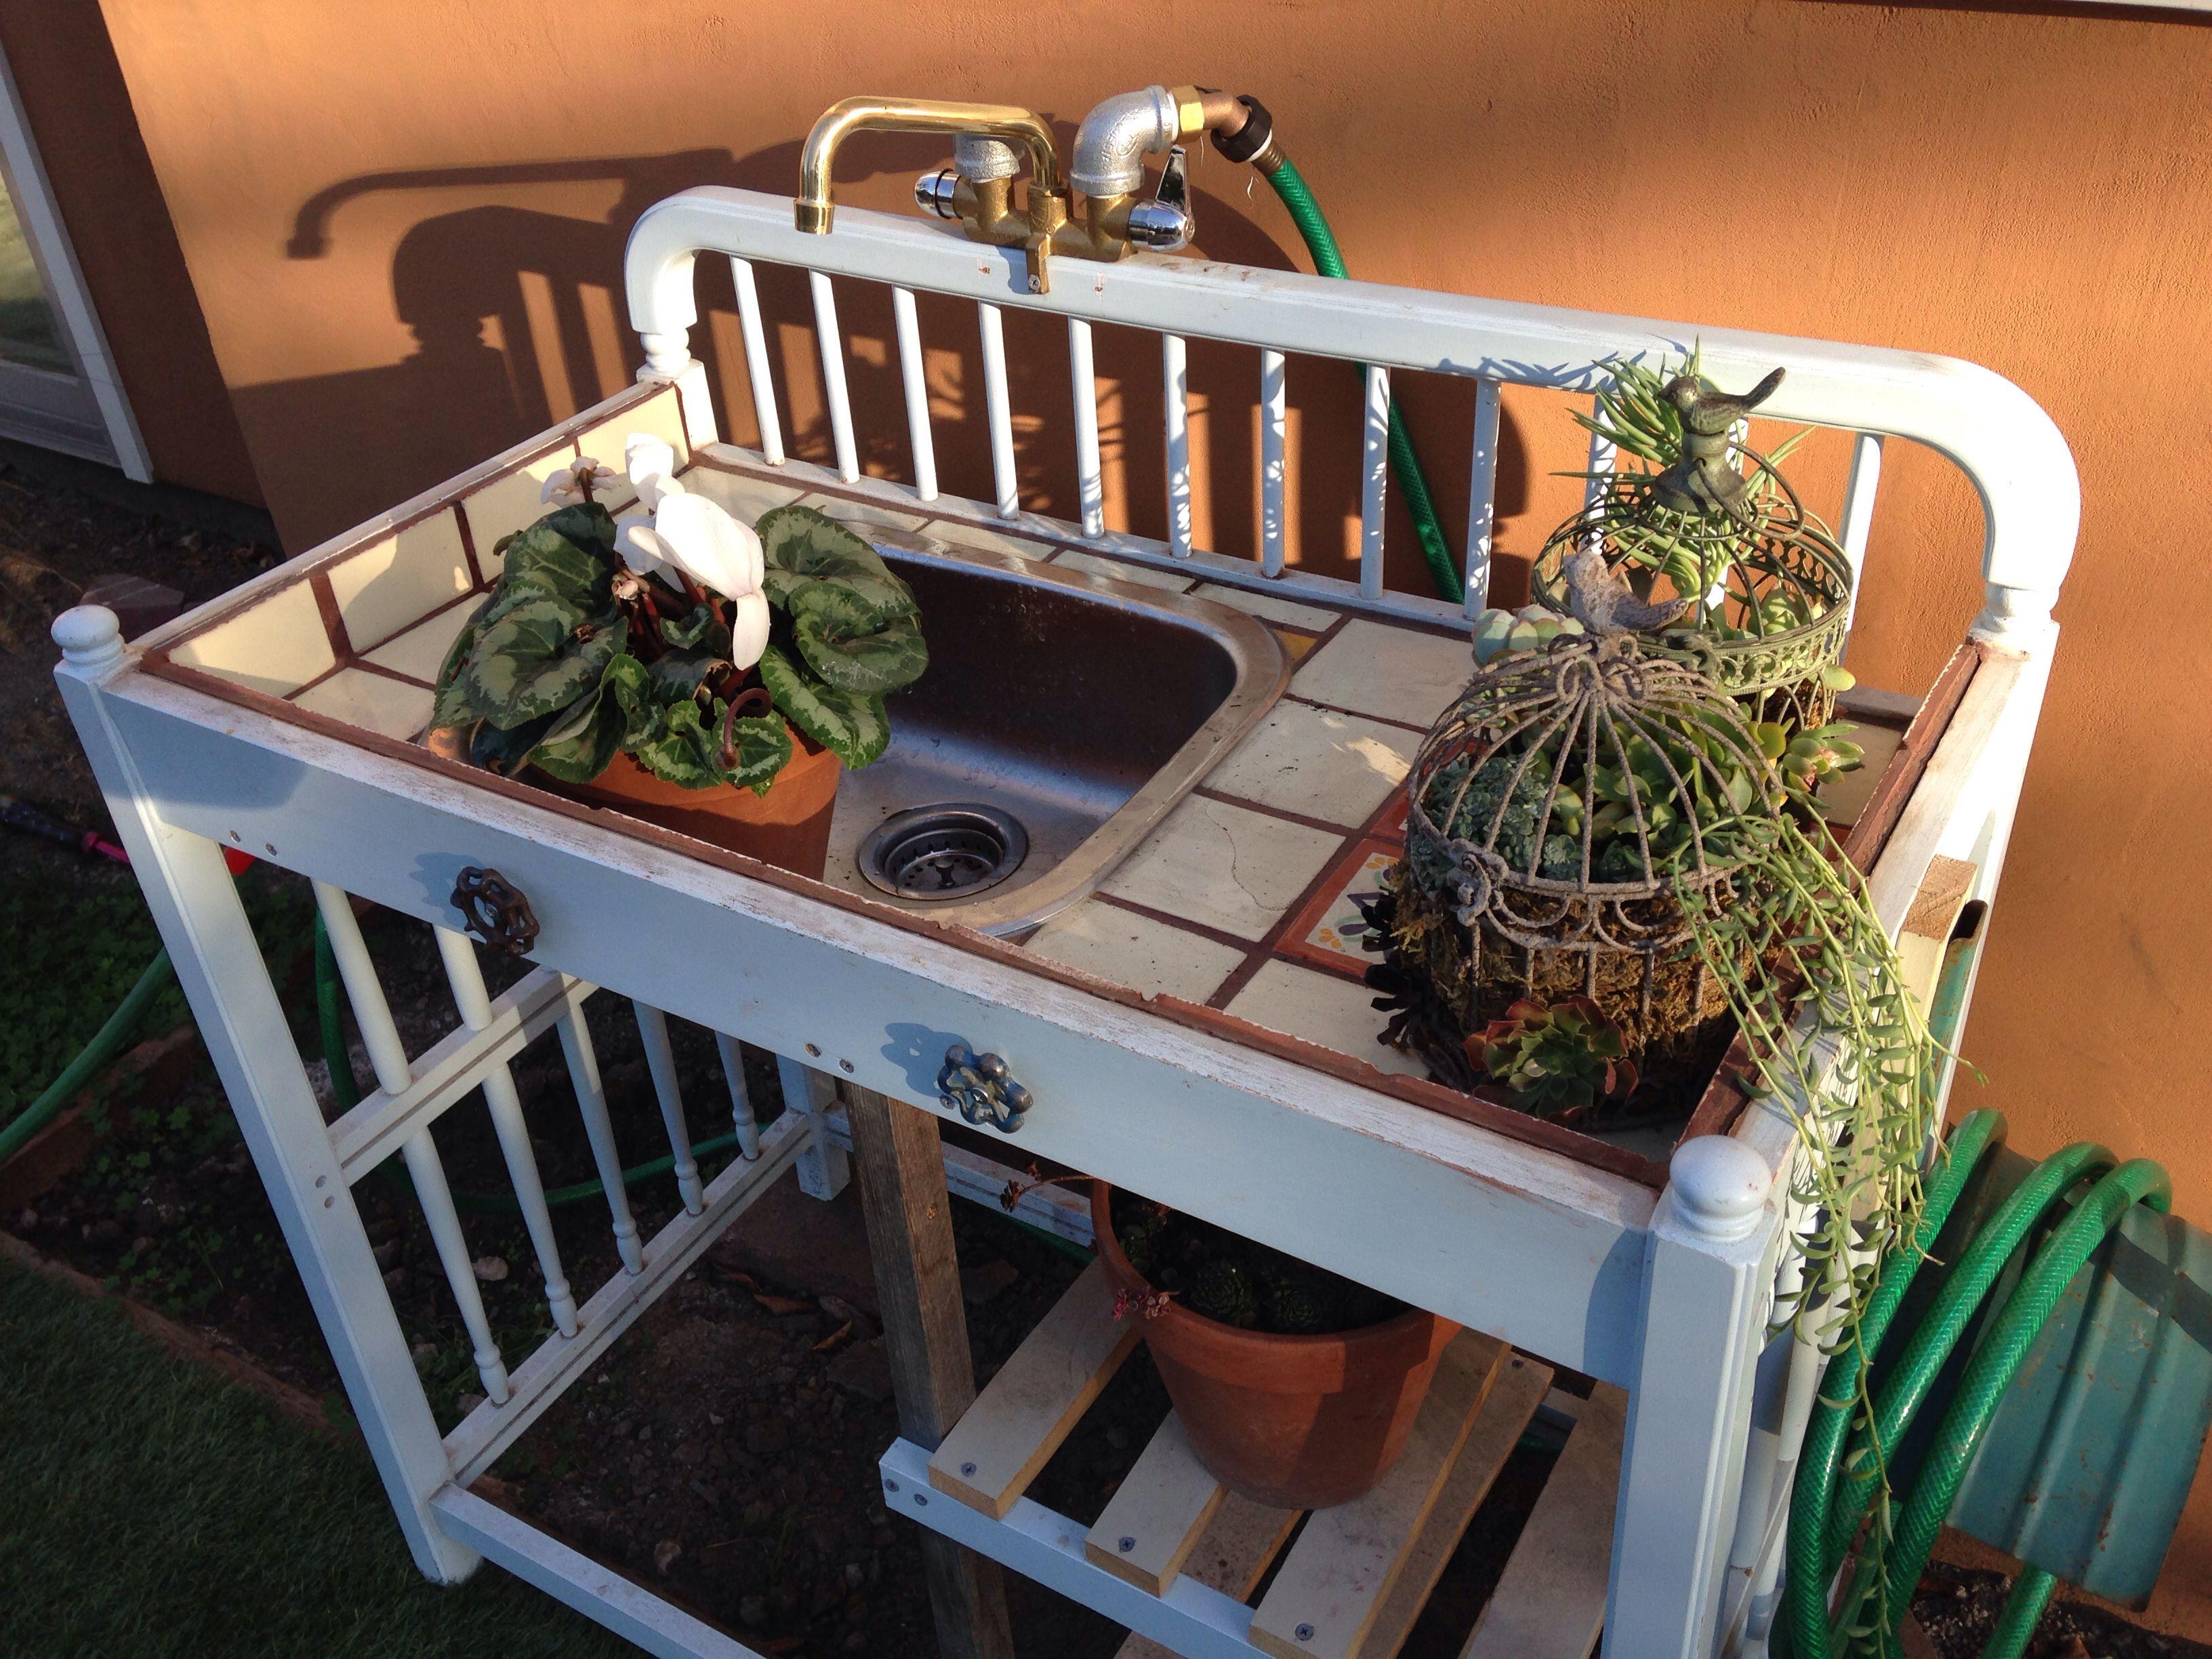 Old Baby Crib Bench